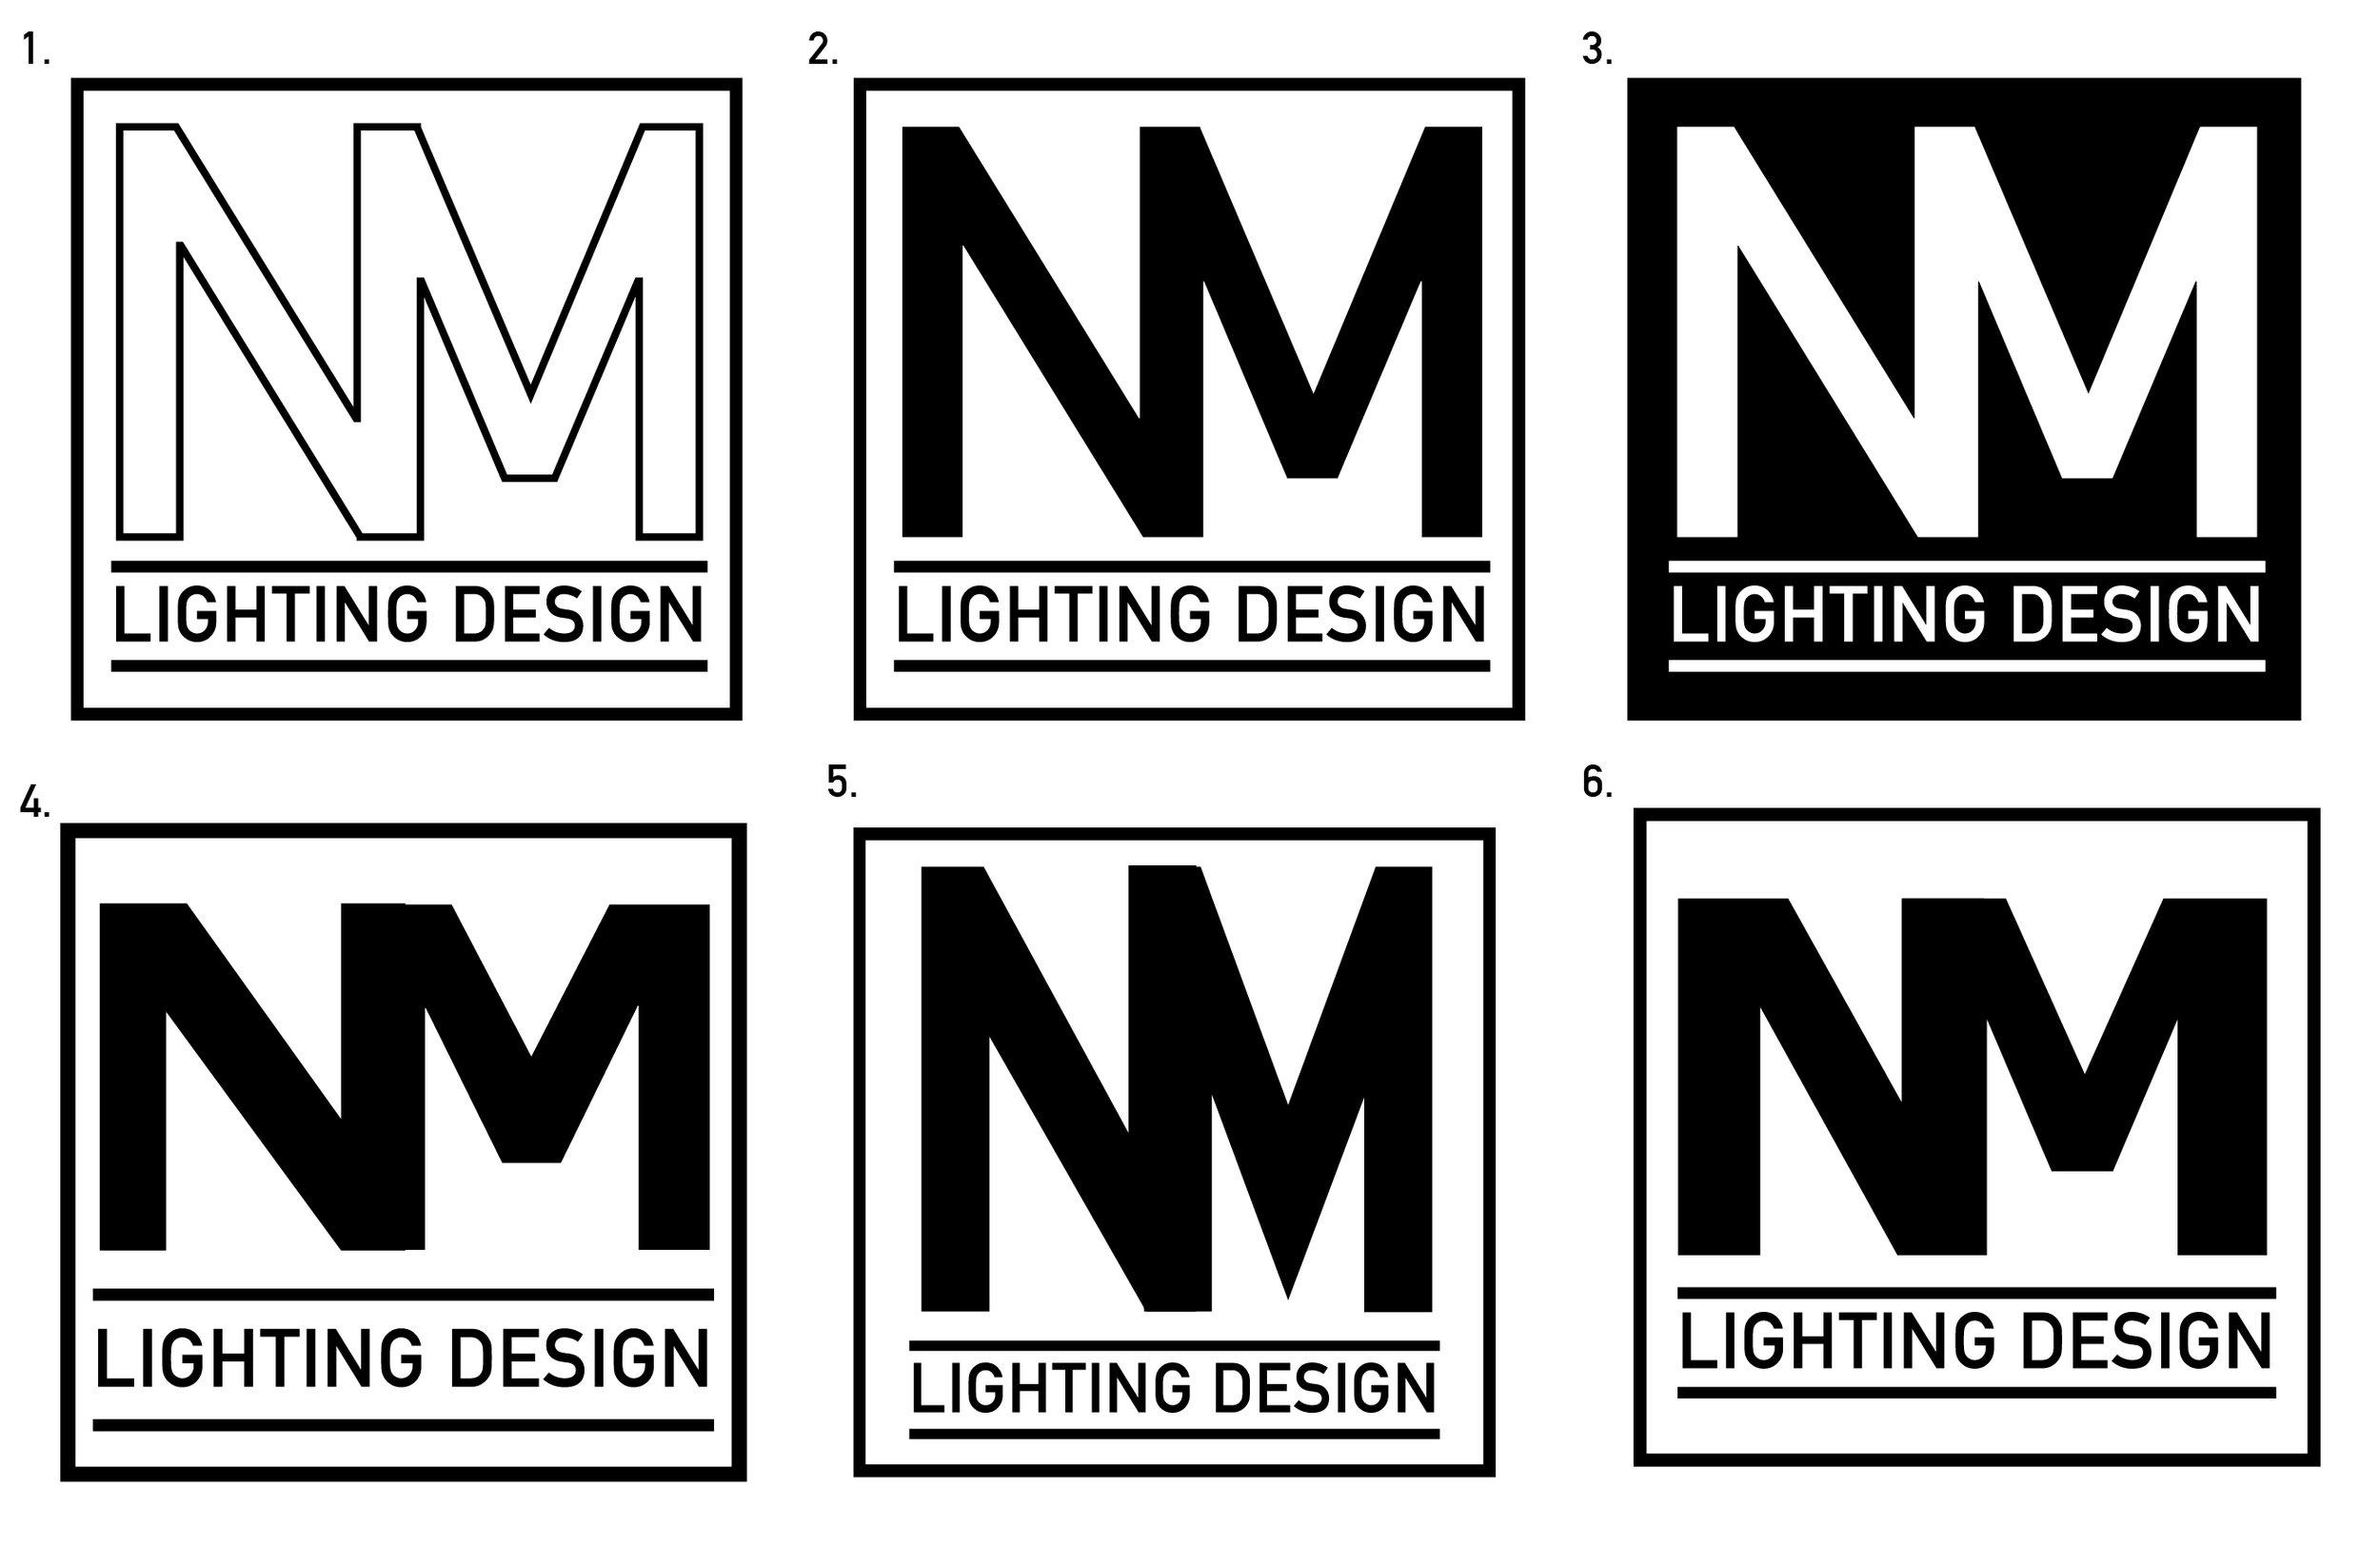 NM Lighting 2-01.jpg